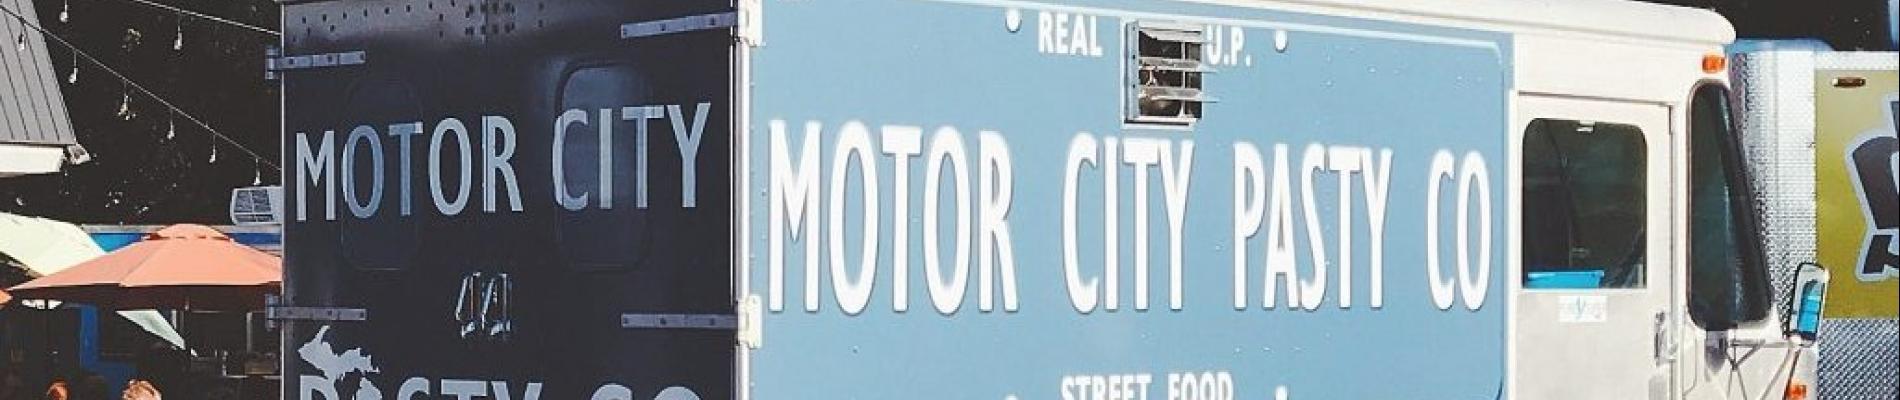 Food Truck Friday - Motor City Pasty!